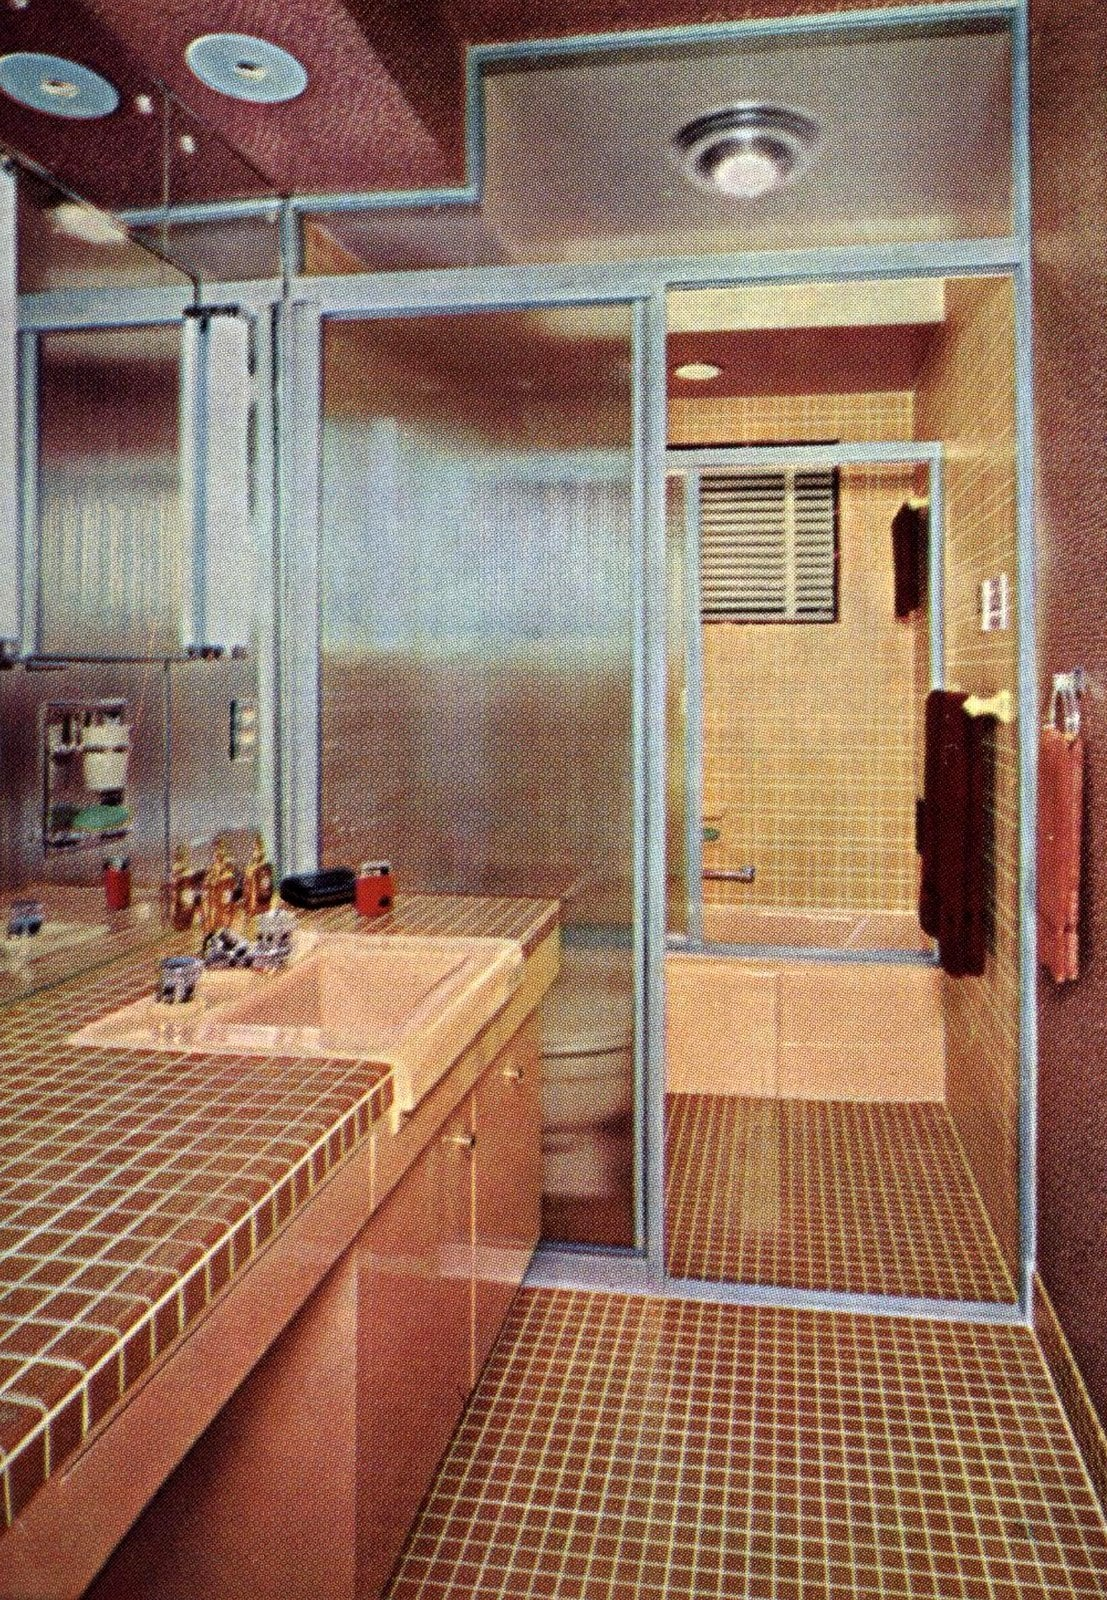 Vintage bathroom decor with brown and beige tile (1954)